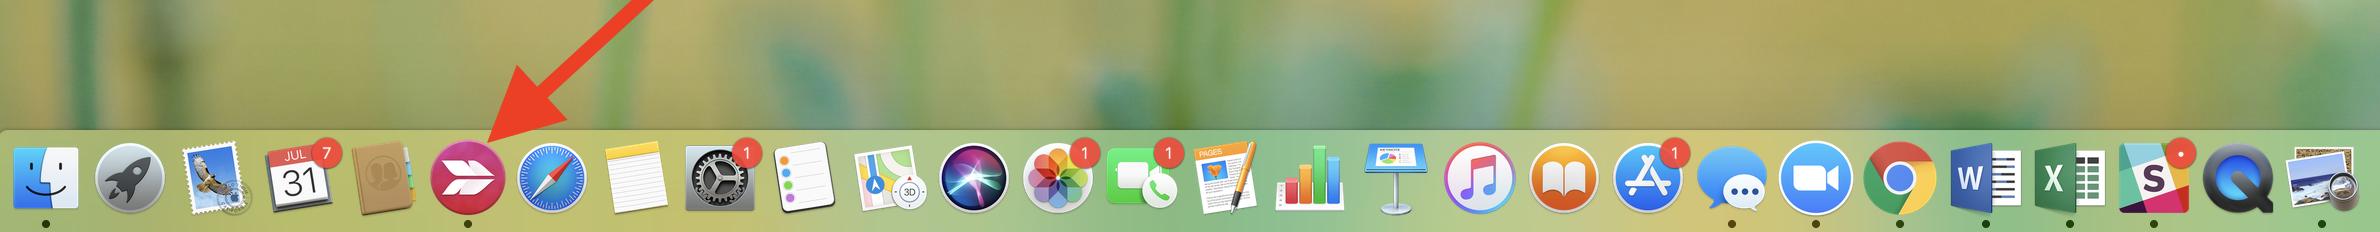 skitch icon mac toolbar